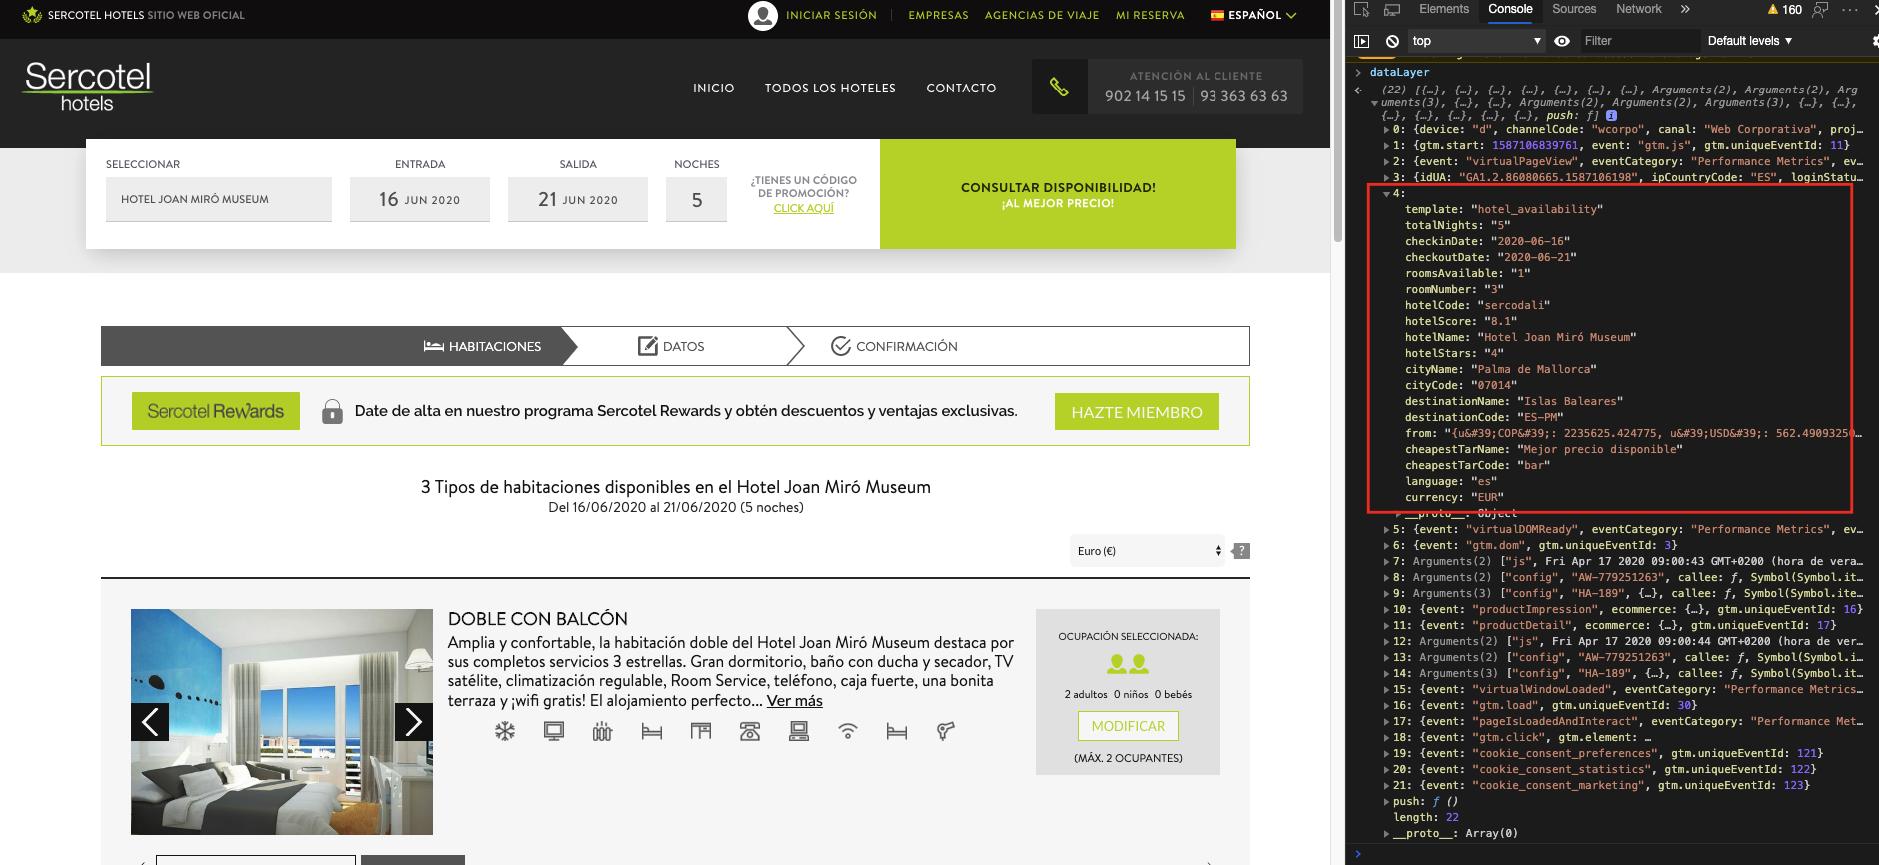 datalayer para hoteles - roiback